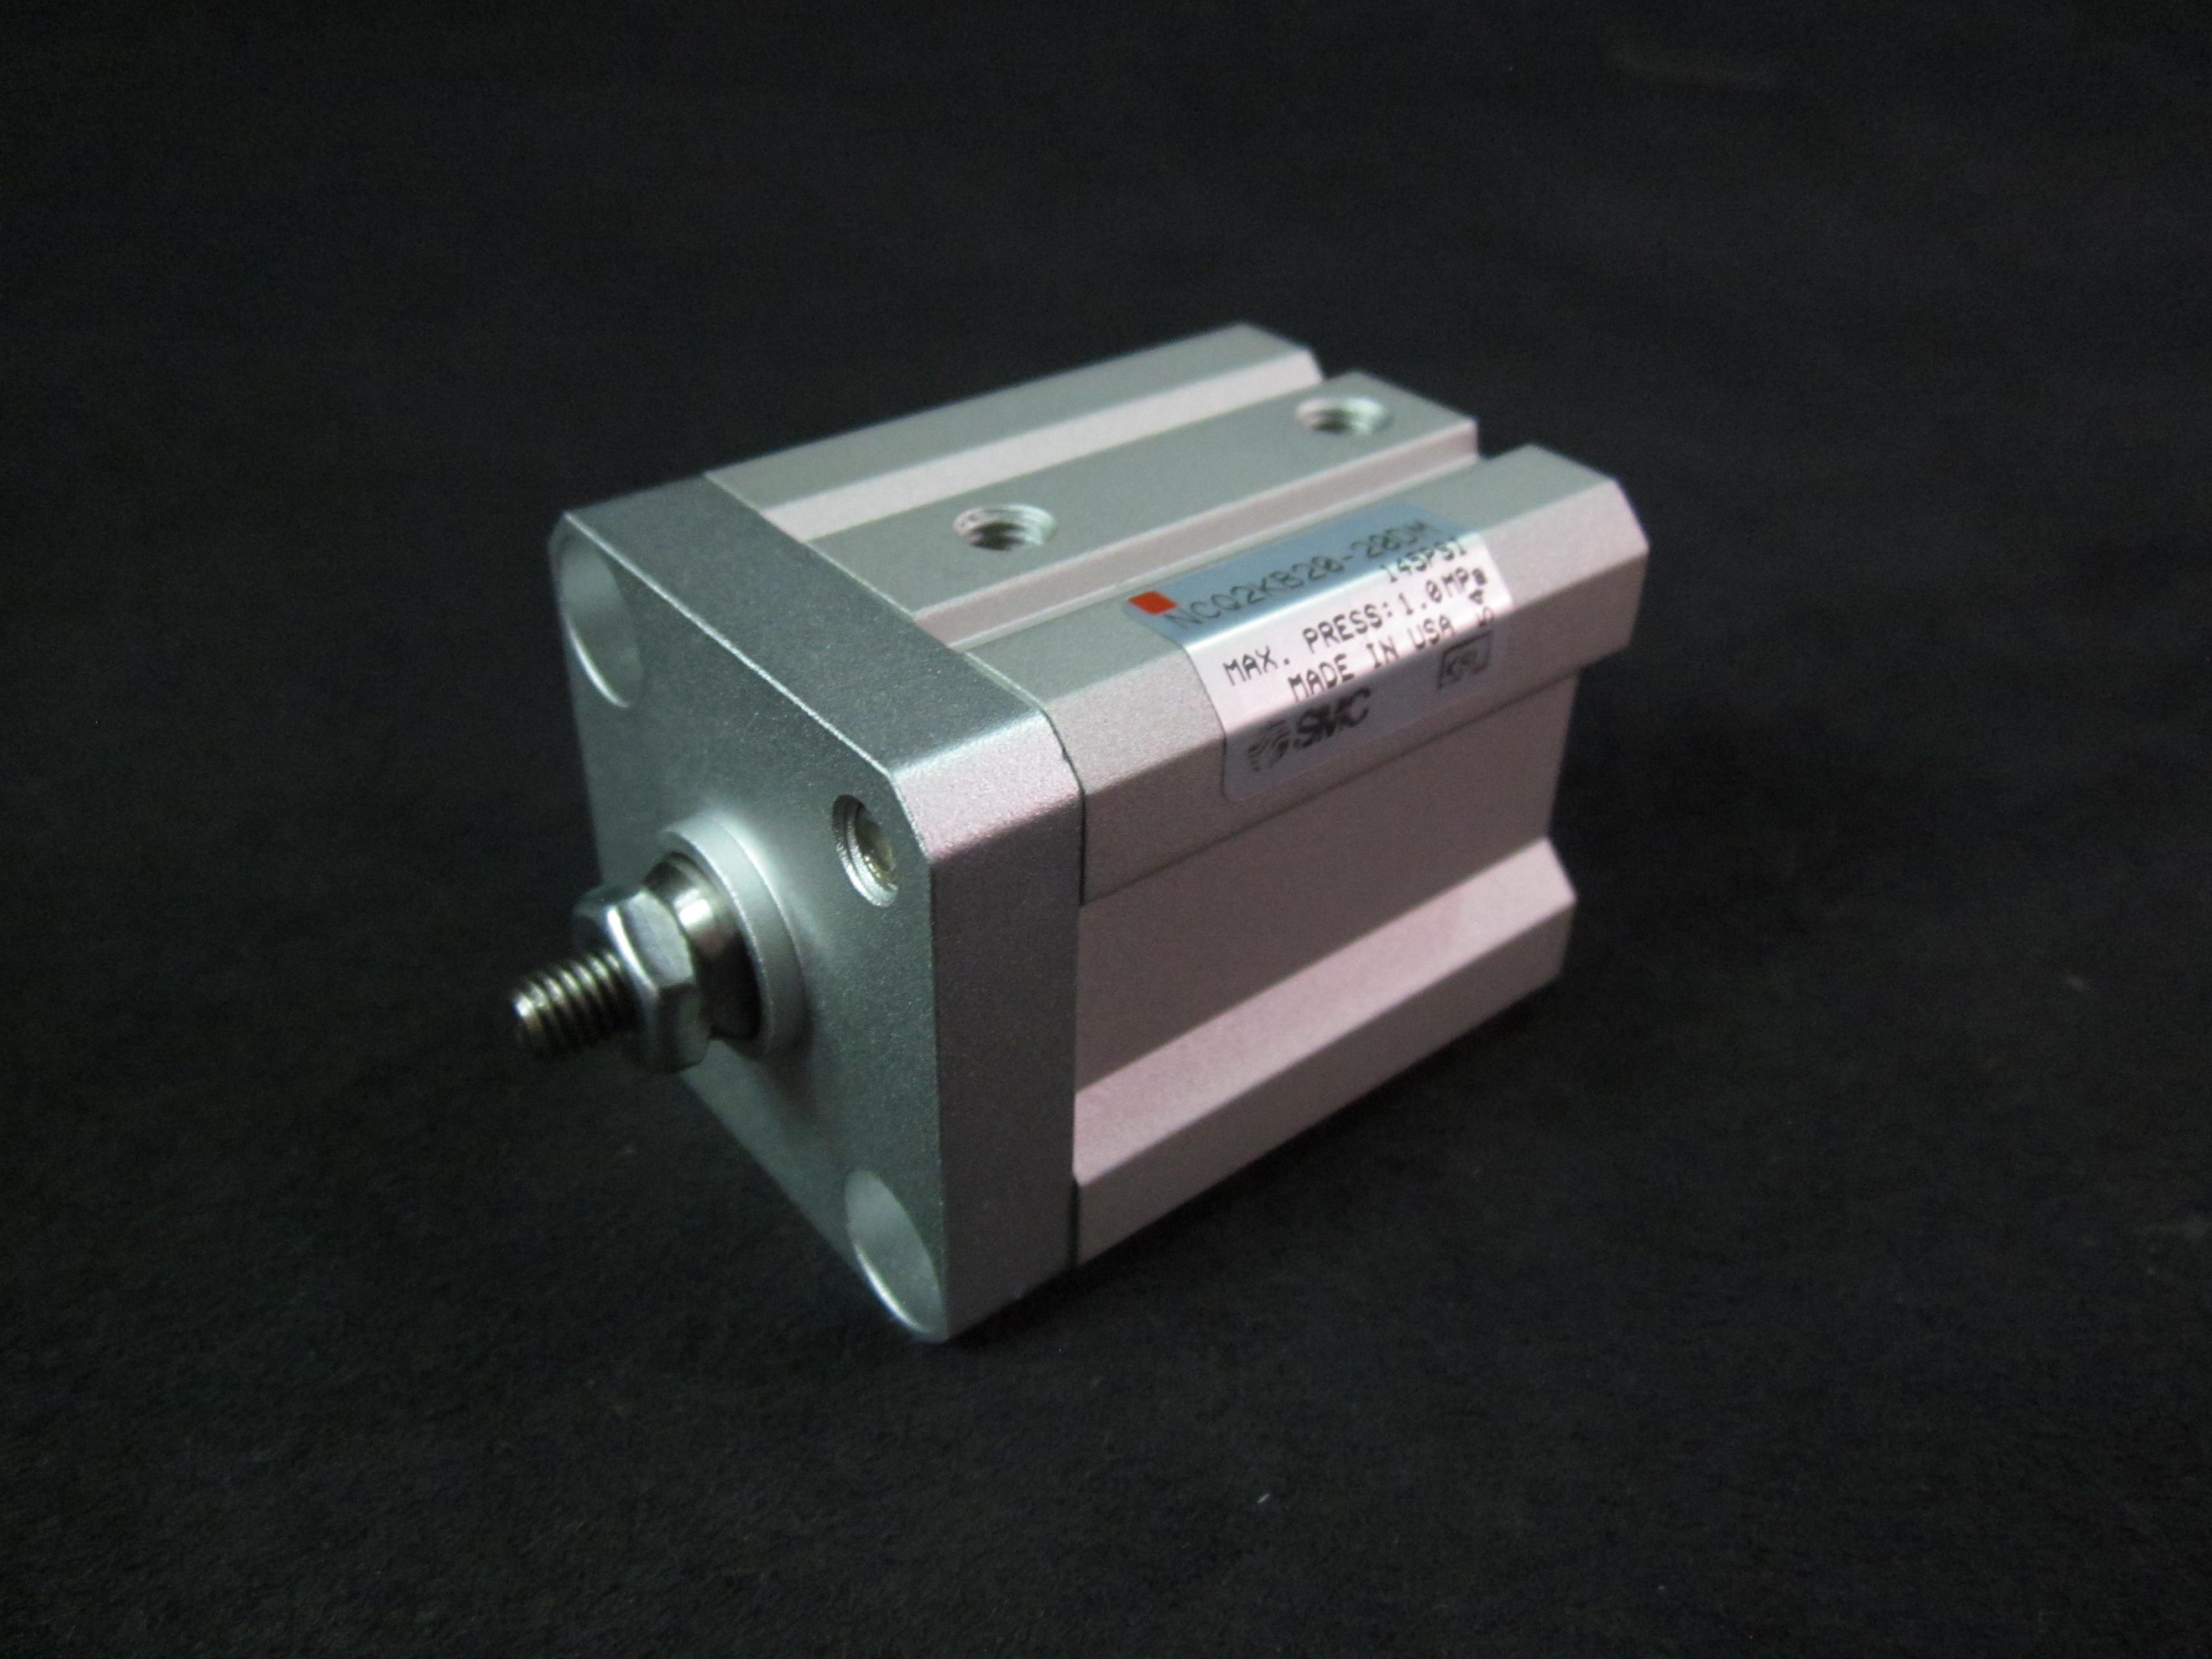 Cylinder  20MM BORE 20MM STROKE DBL ACT MA SMC NCQ2KB20-20DM  (AMAT) 3020-00093